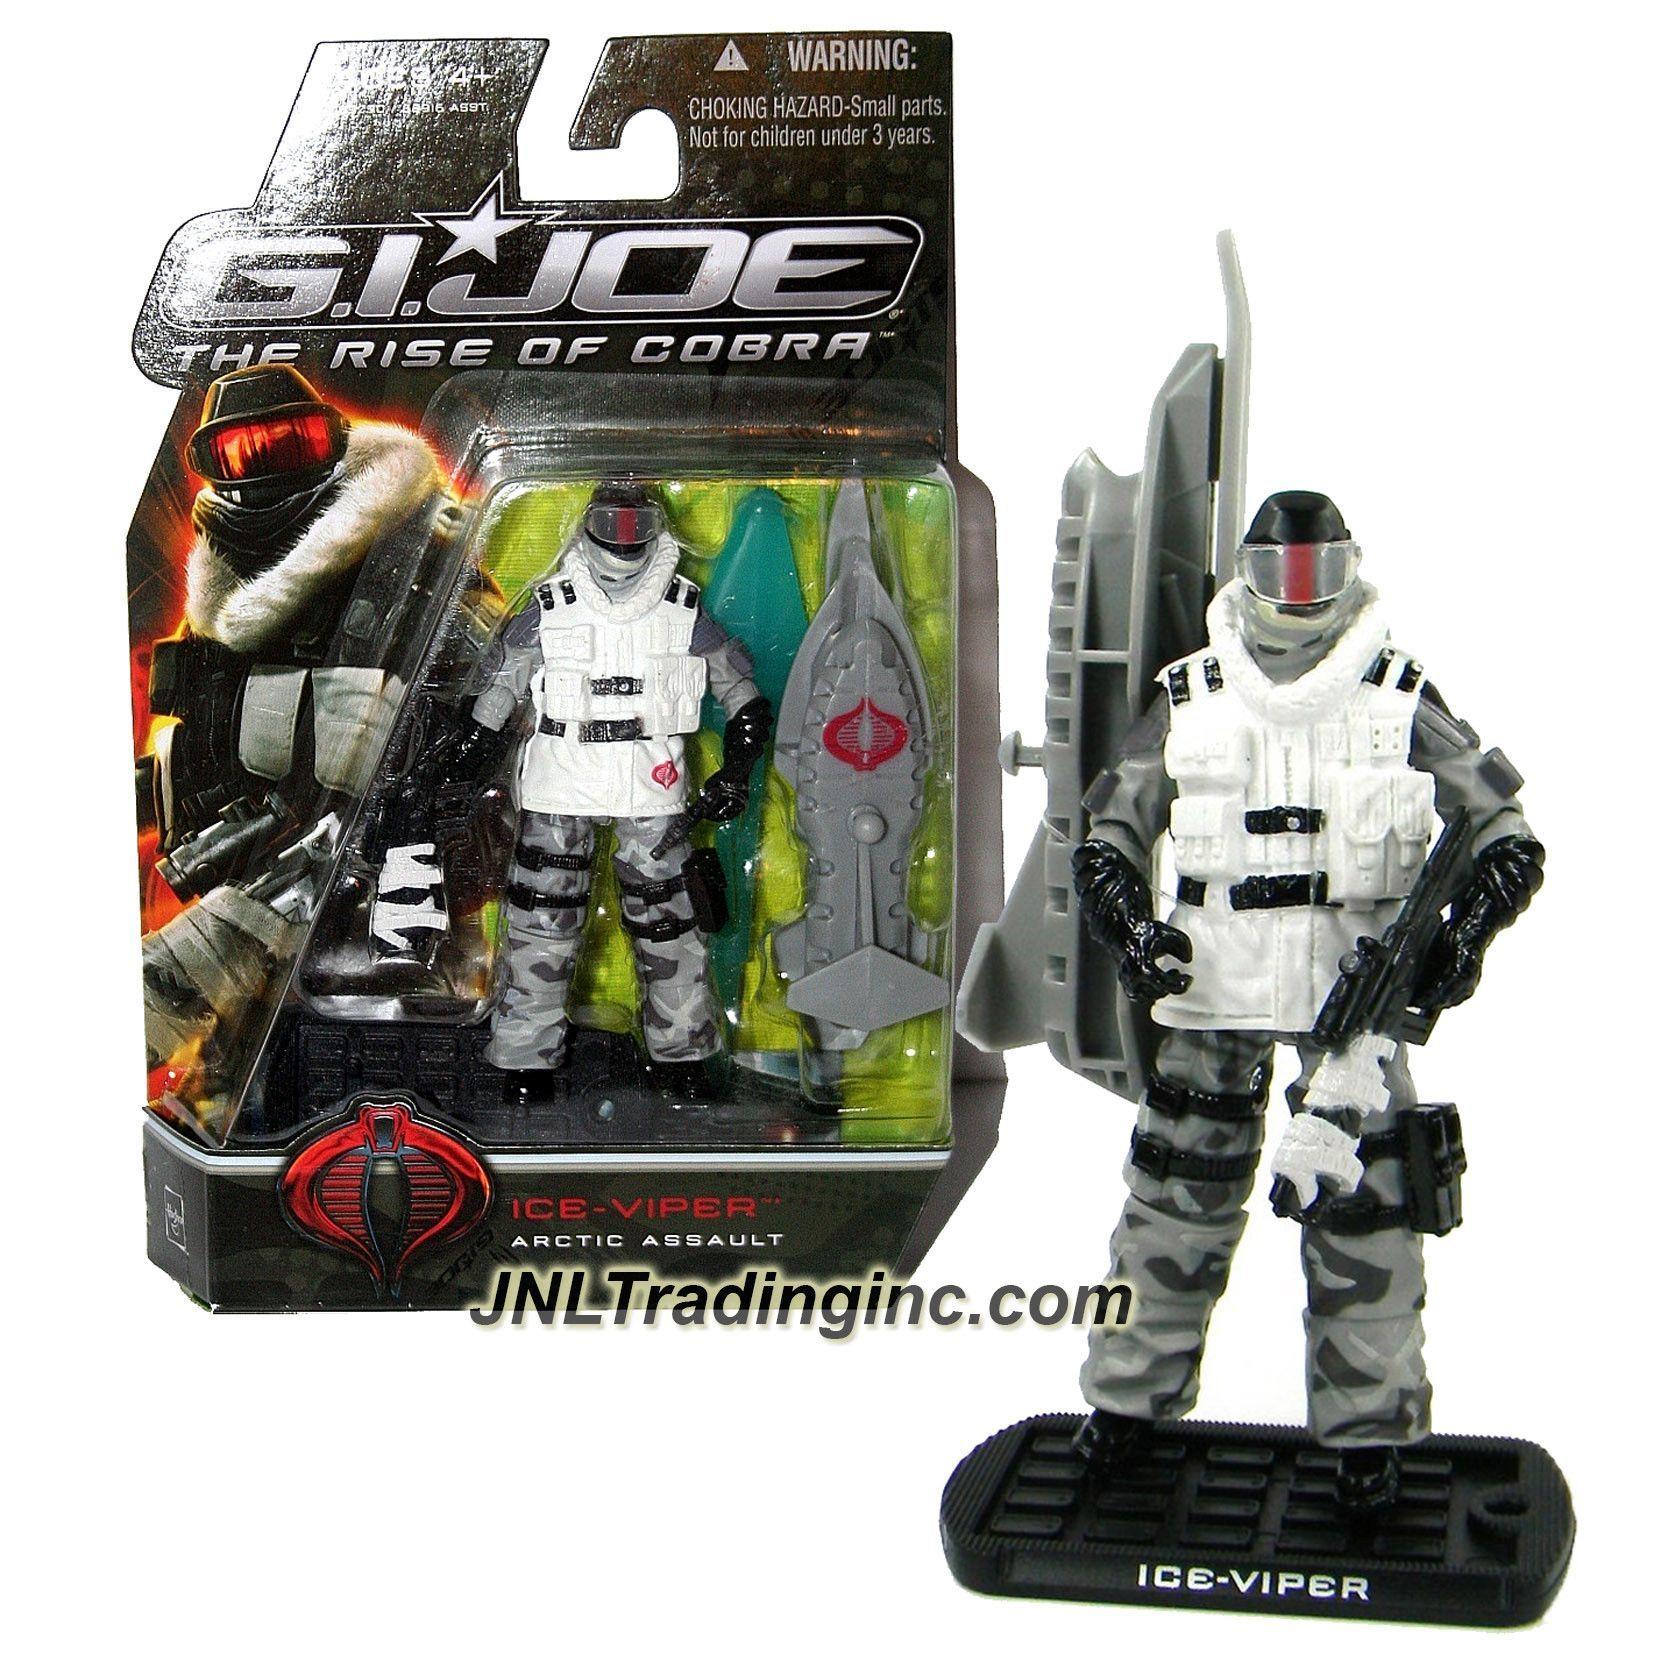 Action Force//GI Joe Rise Of Cobra Ice Viper